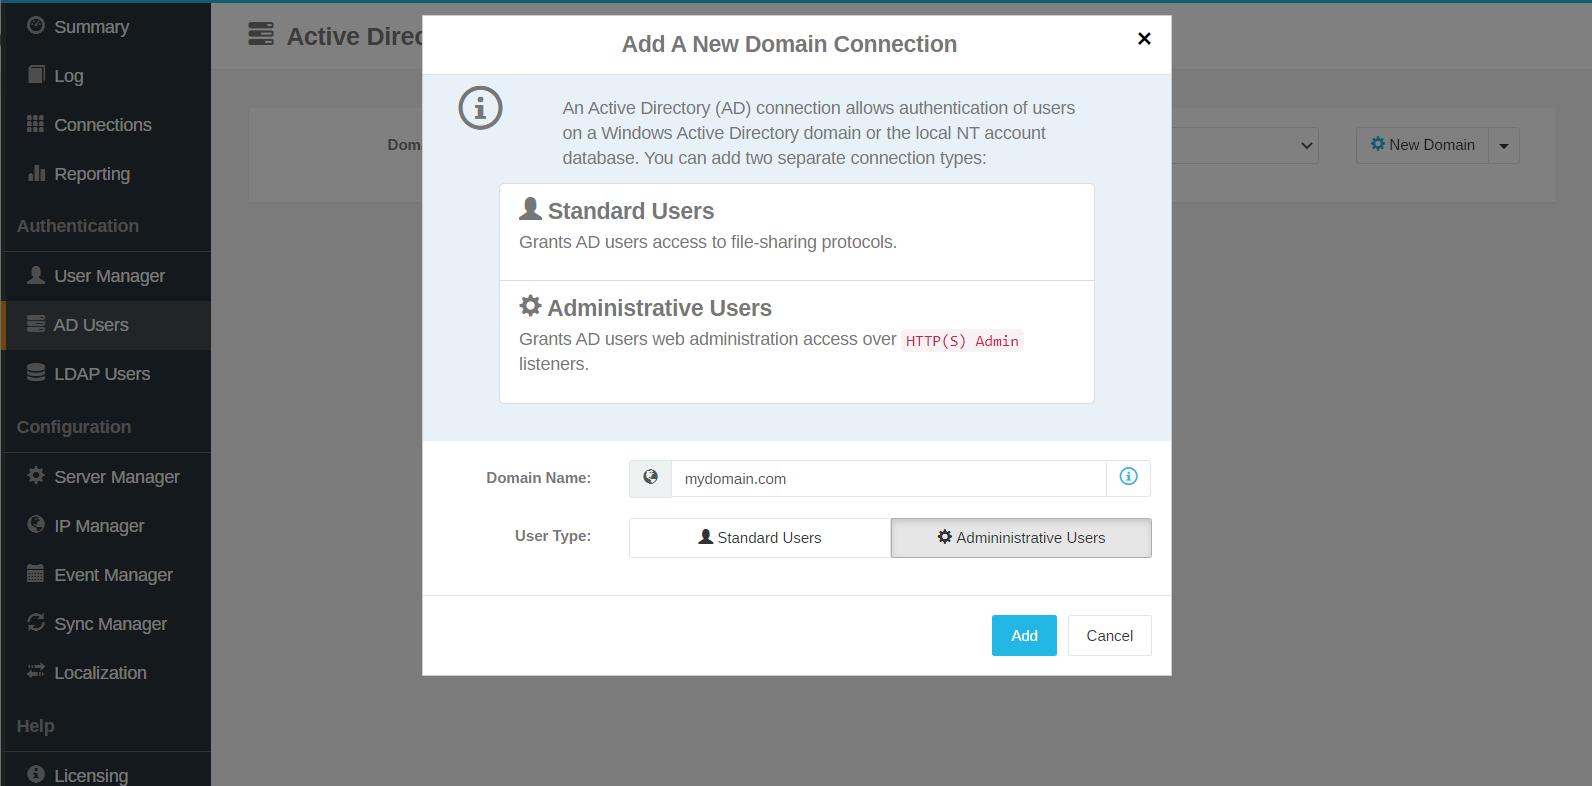 Choose between Cerberus Ftp Server's Standard or Administrative Users